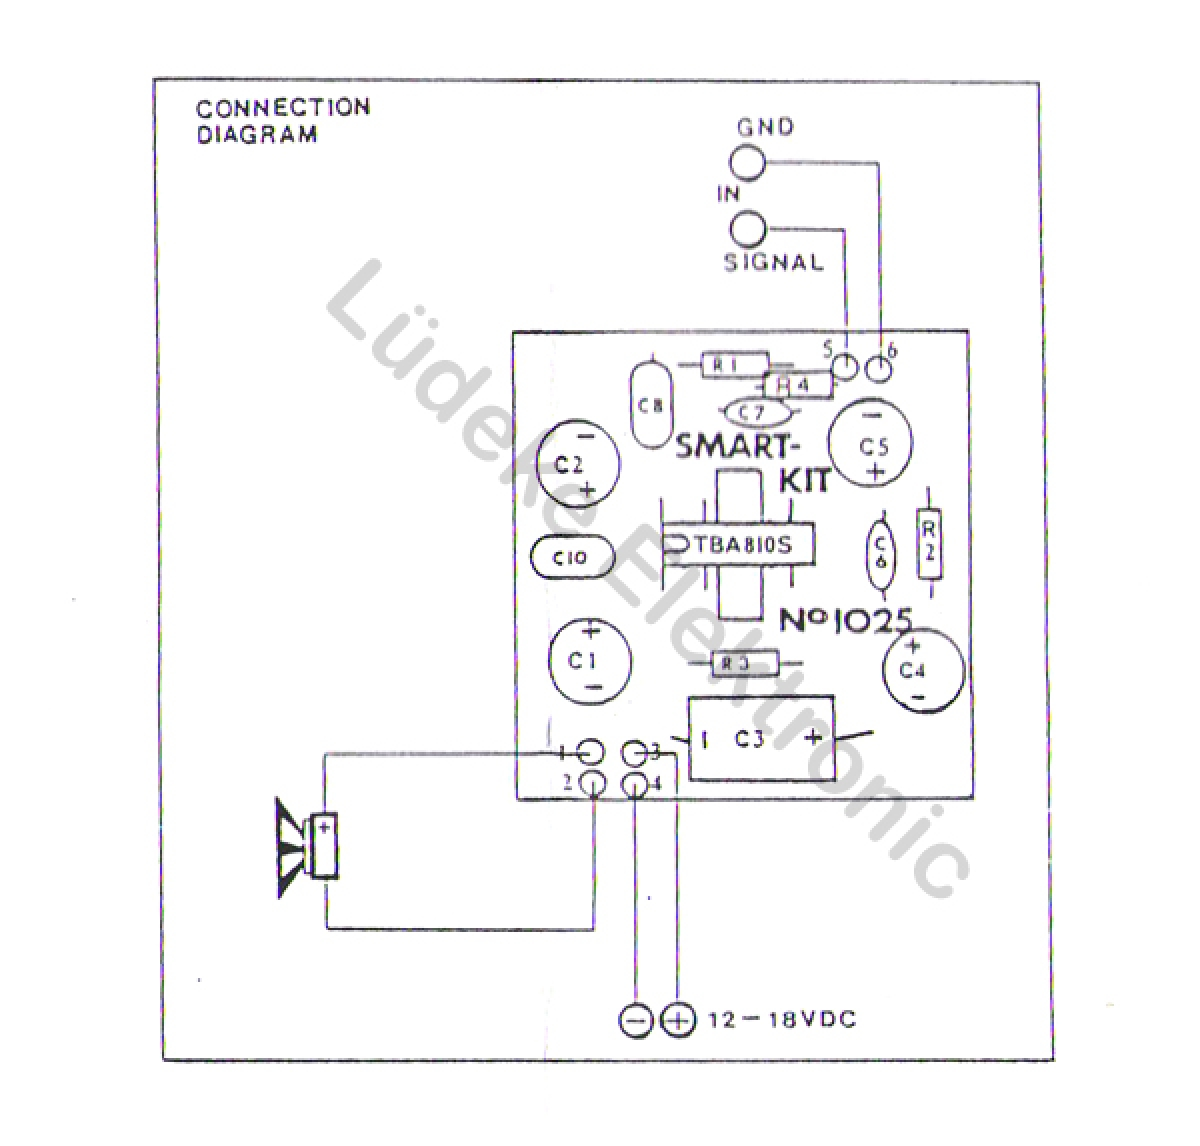 Hifi Verstrker Mono 7 Watt 12v 18v B1025 Smart Kit Bausatz 32ohms Usb Interface Female Circuit Diagram Of Mp3 Player